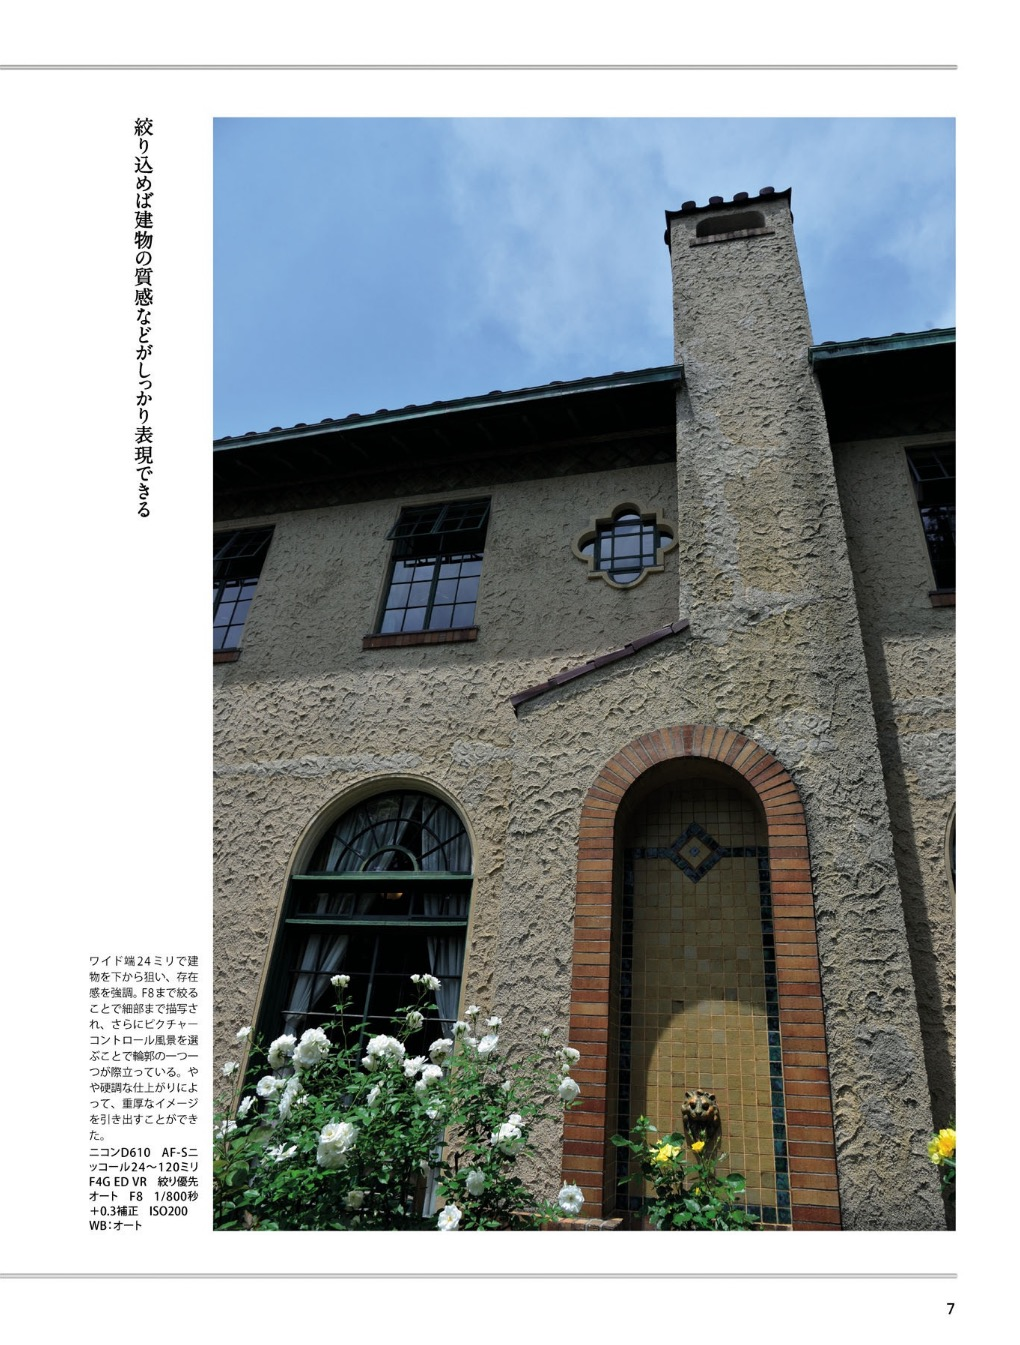 nikon-lens-guide-04